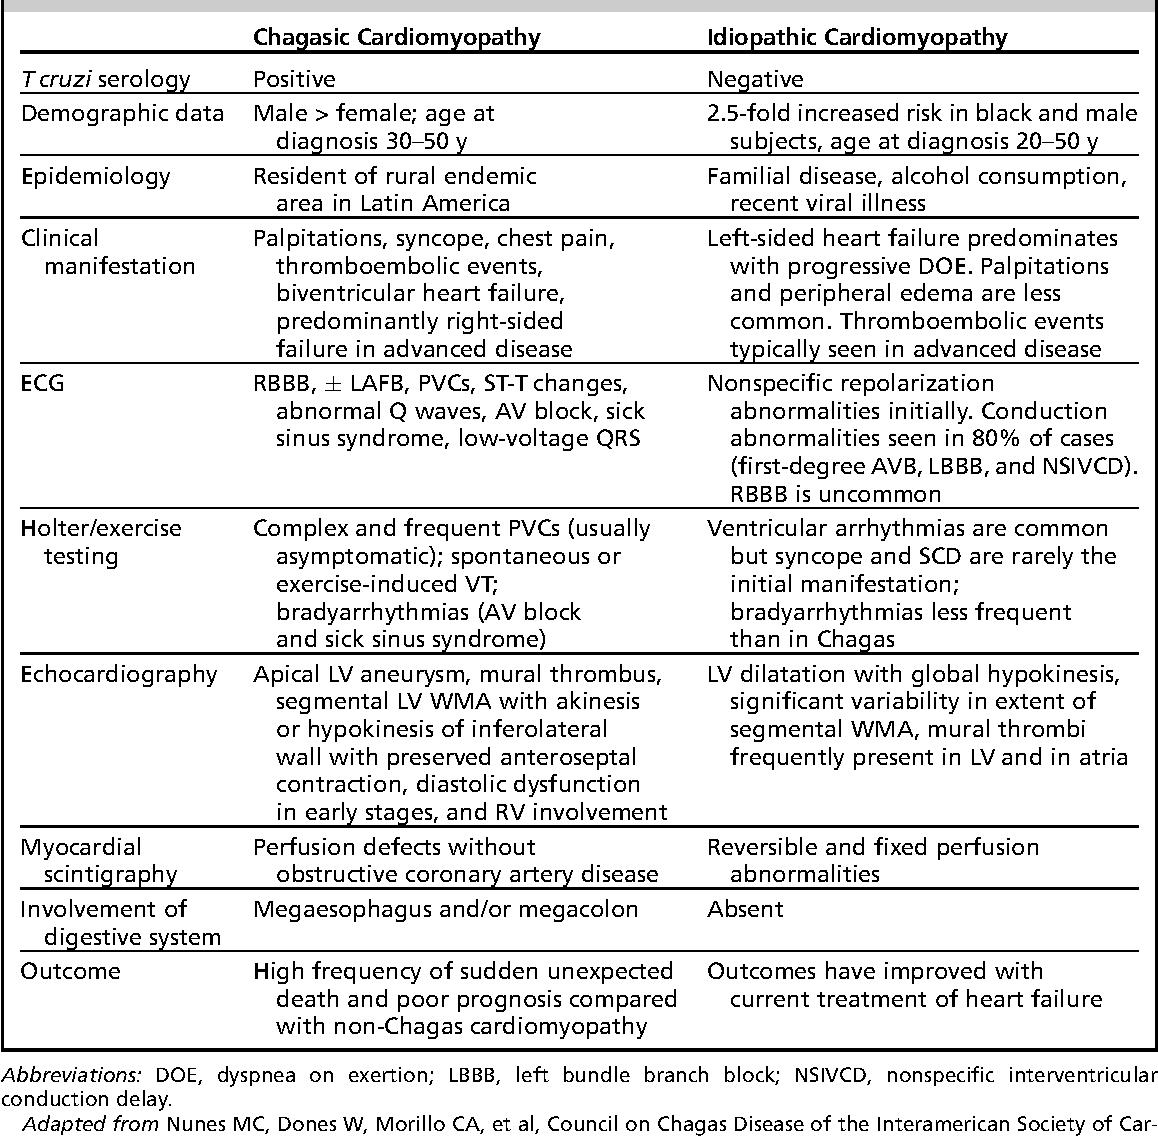 Table 3 from Arrhythmias in chagasic cardiomyopathy